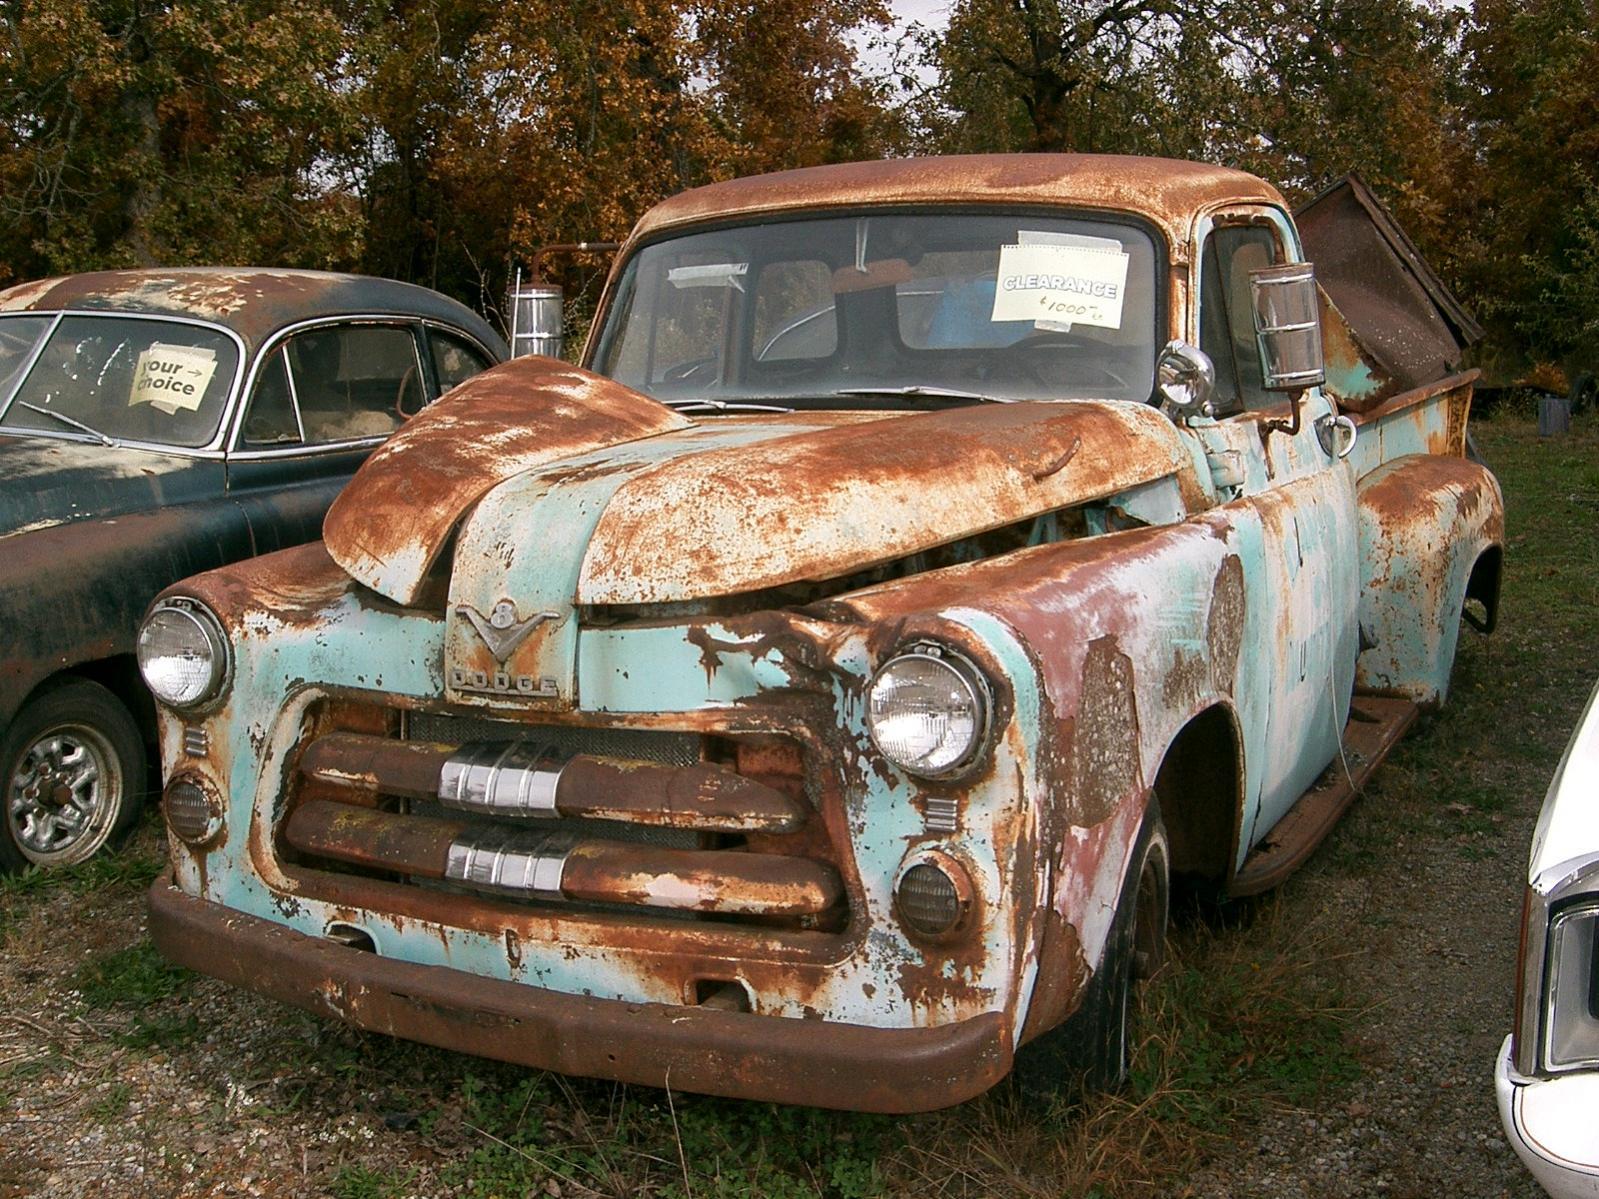 Small Dodge Pickupdodge Power Wagon Pickup 4x4 Truck Powerwagon Ram 1954 Retro H Wallpaper 1599x1199 173043